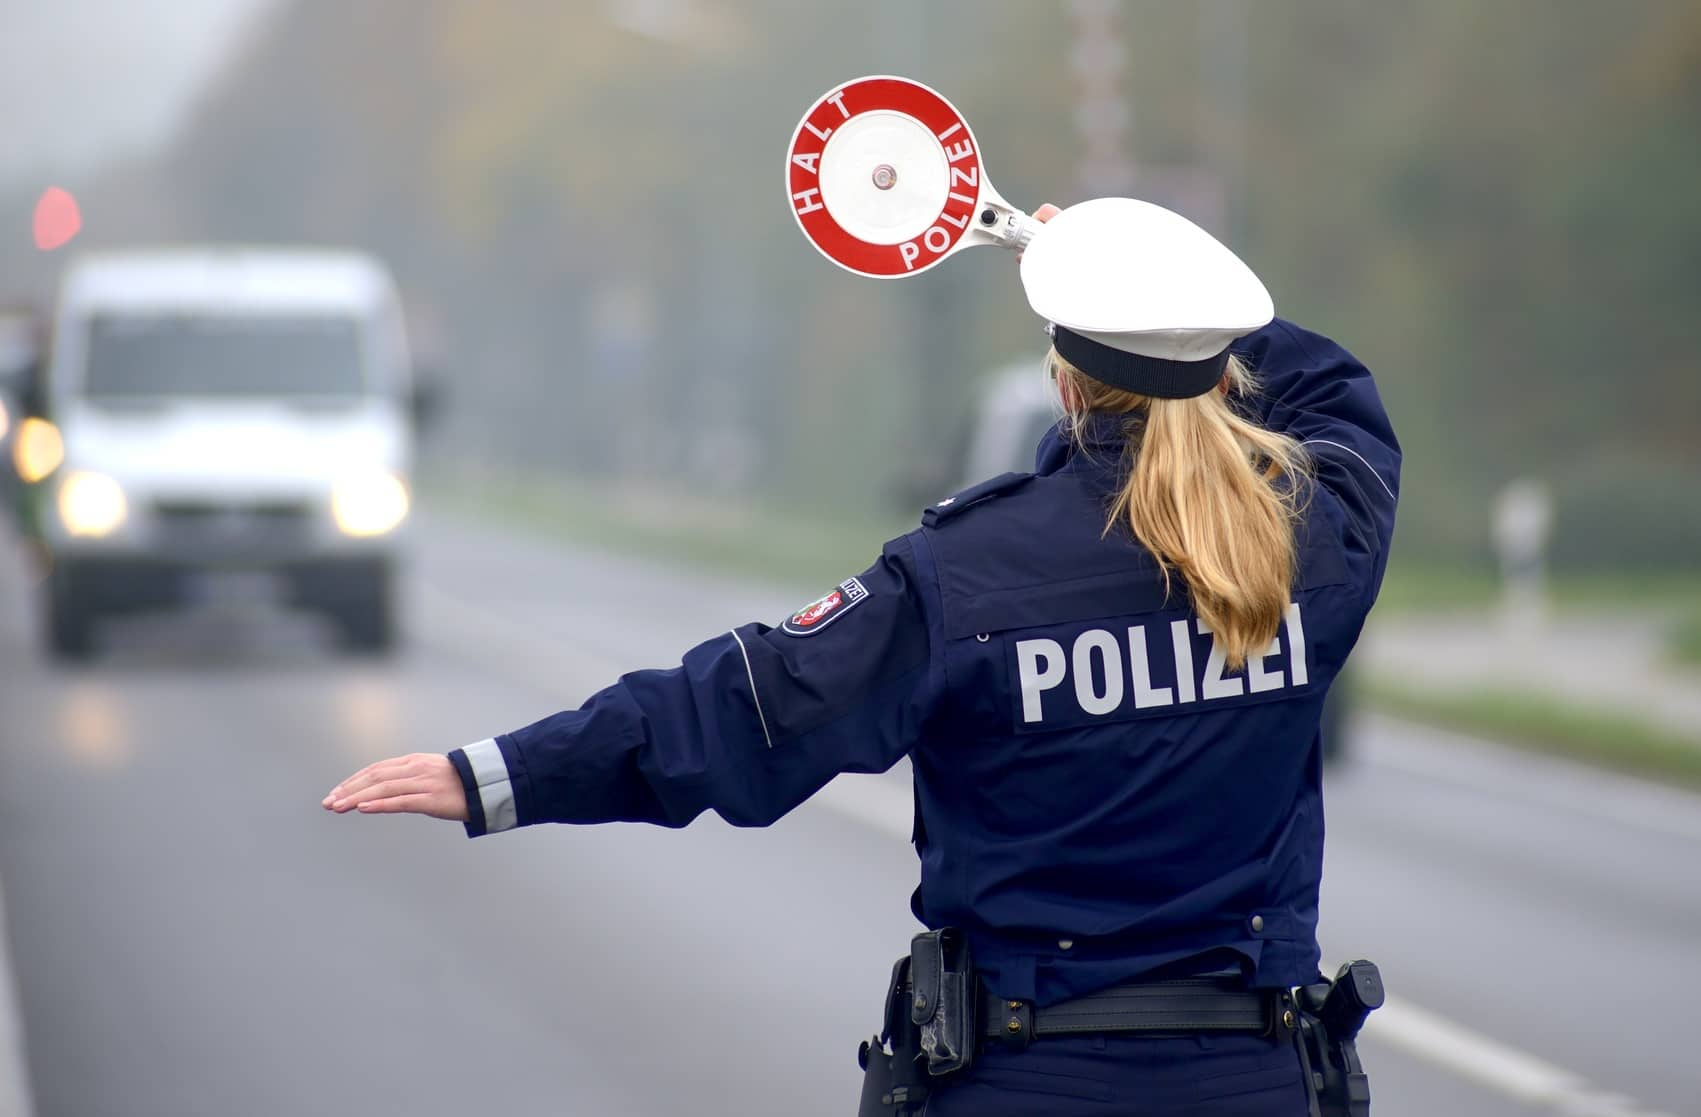 Polizei bei Kontrolle mit Kelle